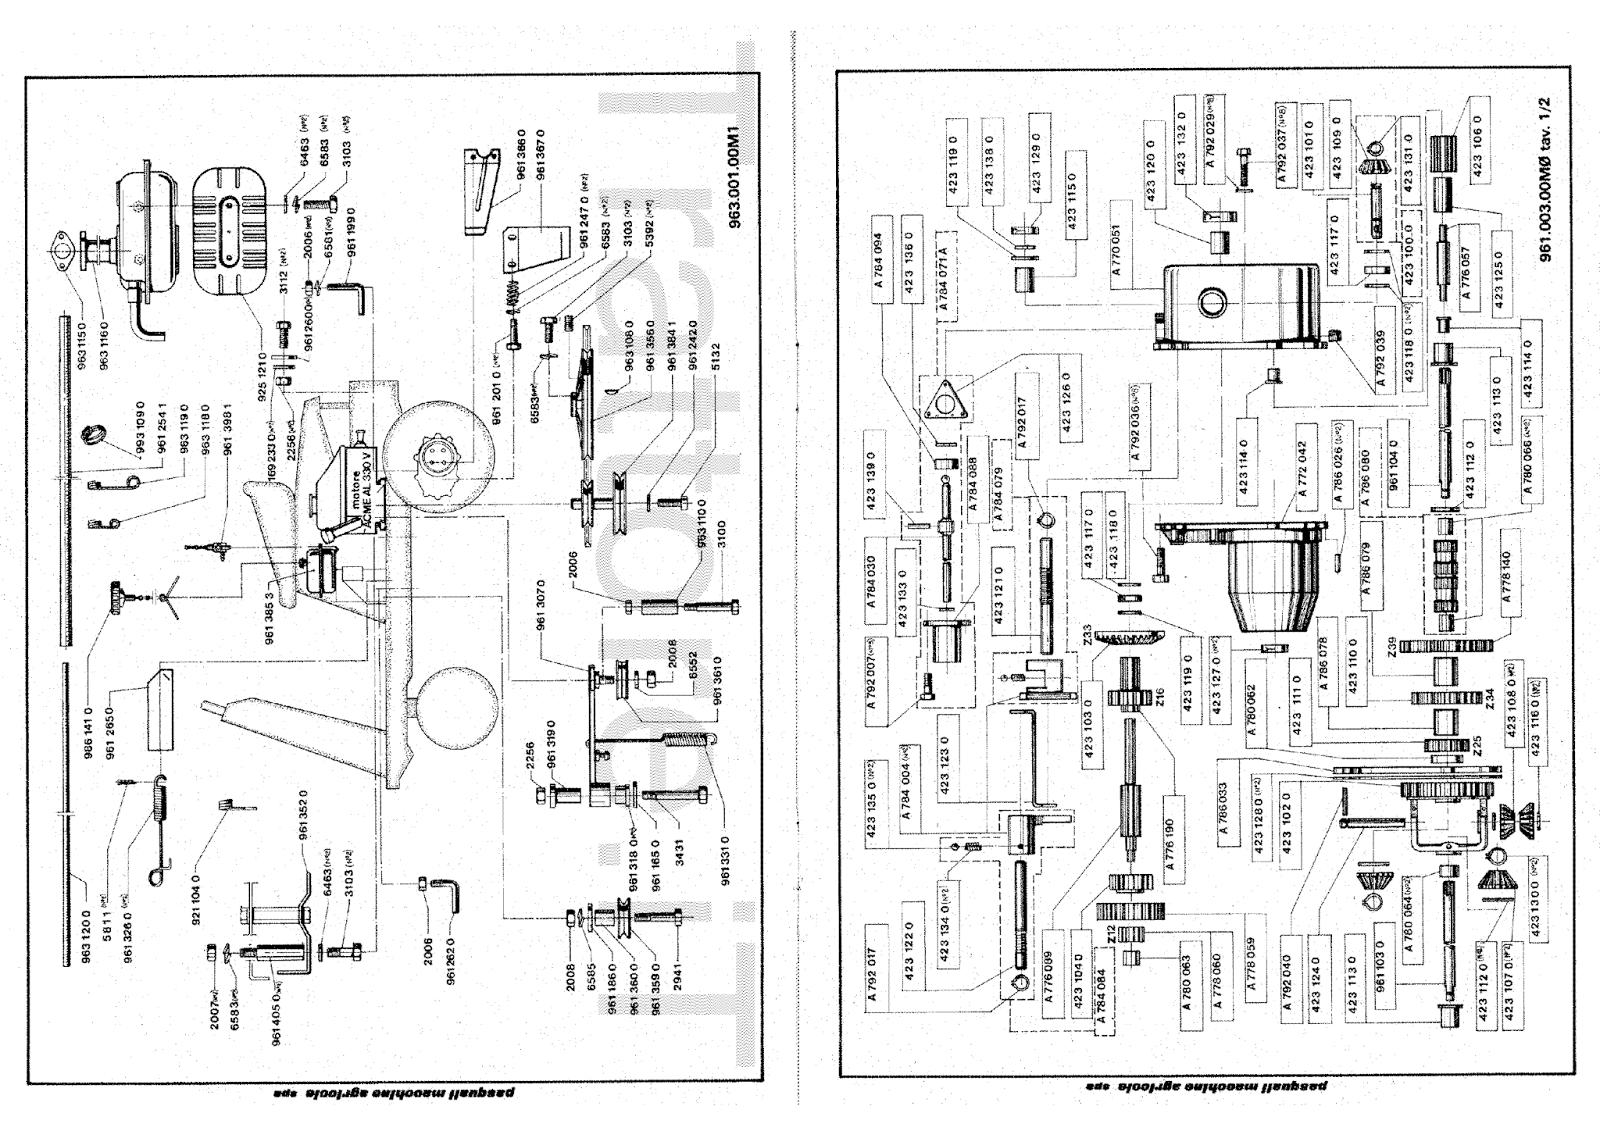 InfoTrattore.it: Gippina pasquali 963 CV 10 Manuale